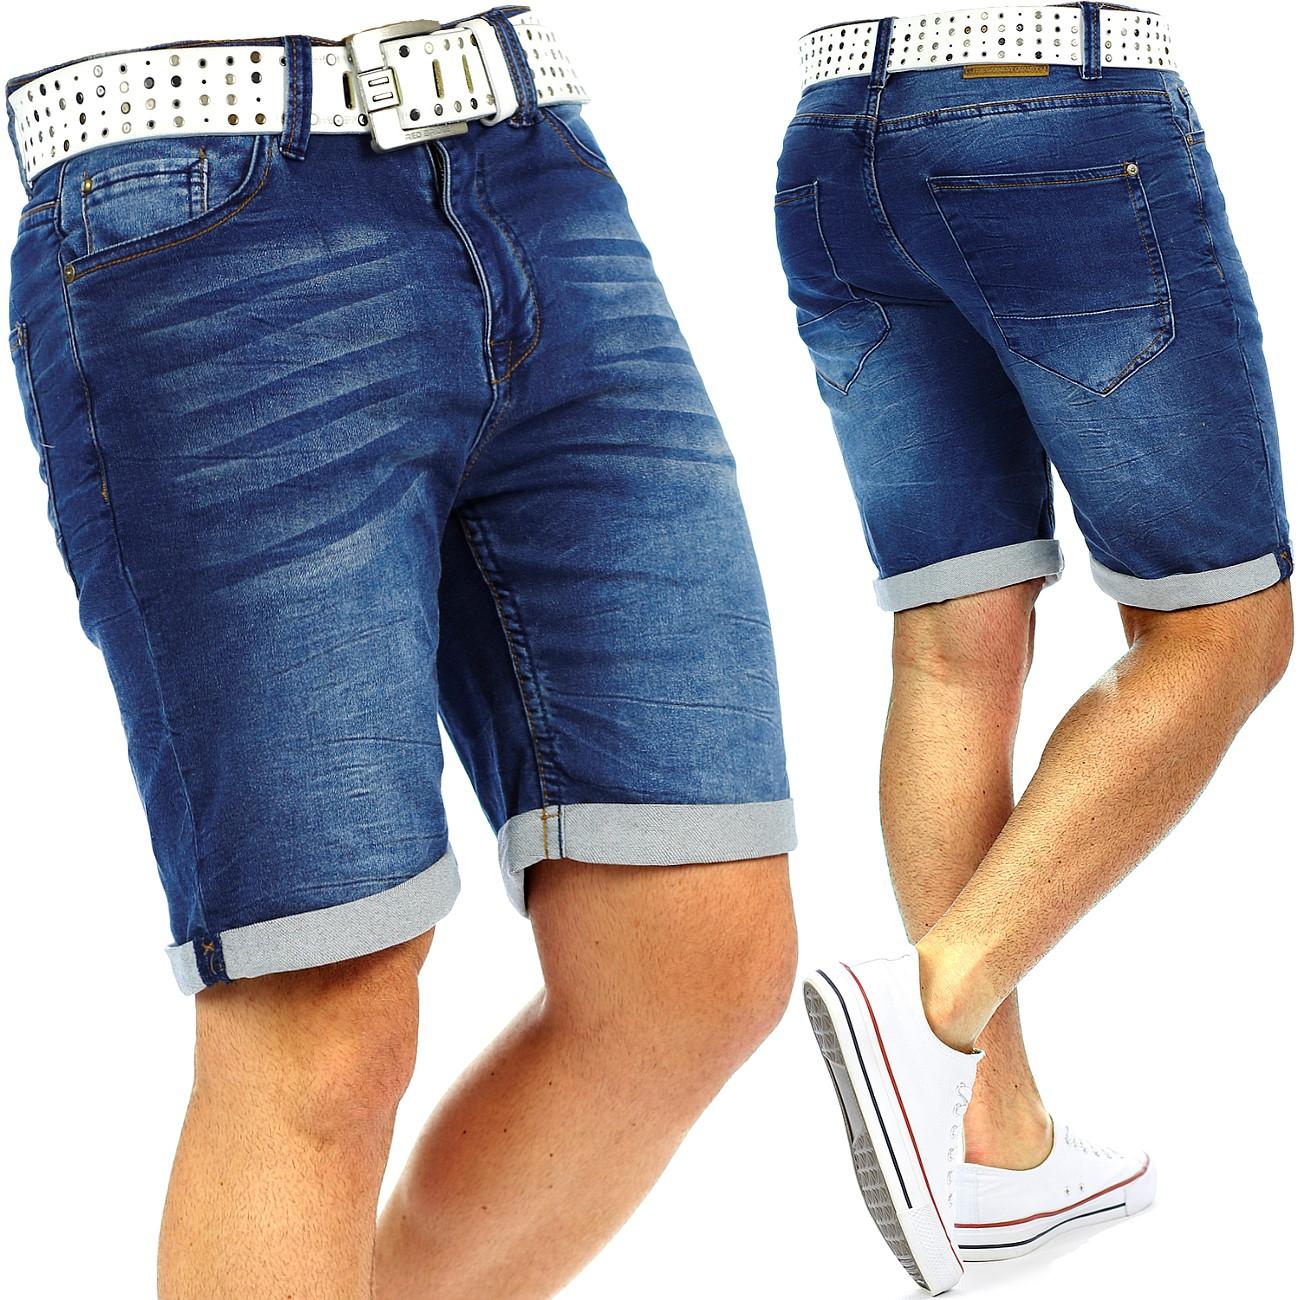 herren jeans shorts capri kurze hose mens pants denim jogging jogg dope swag wow ebay. Black Bedroom Furniture Sets. Home Design Ideas